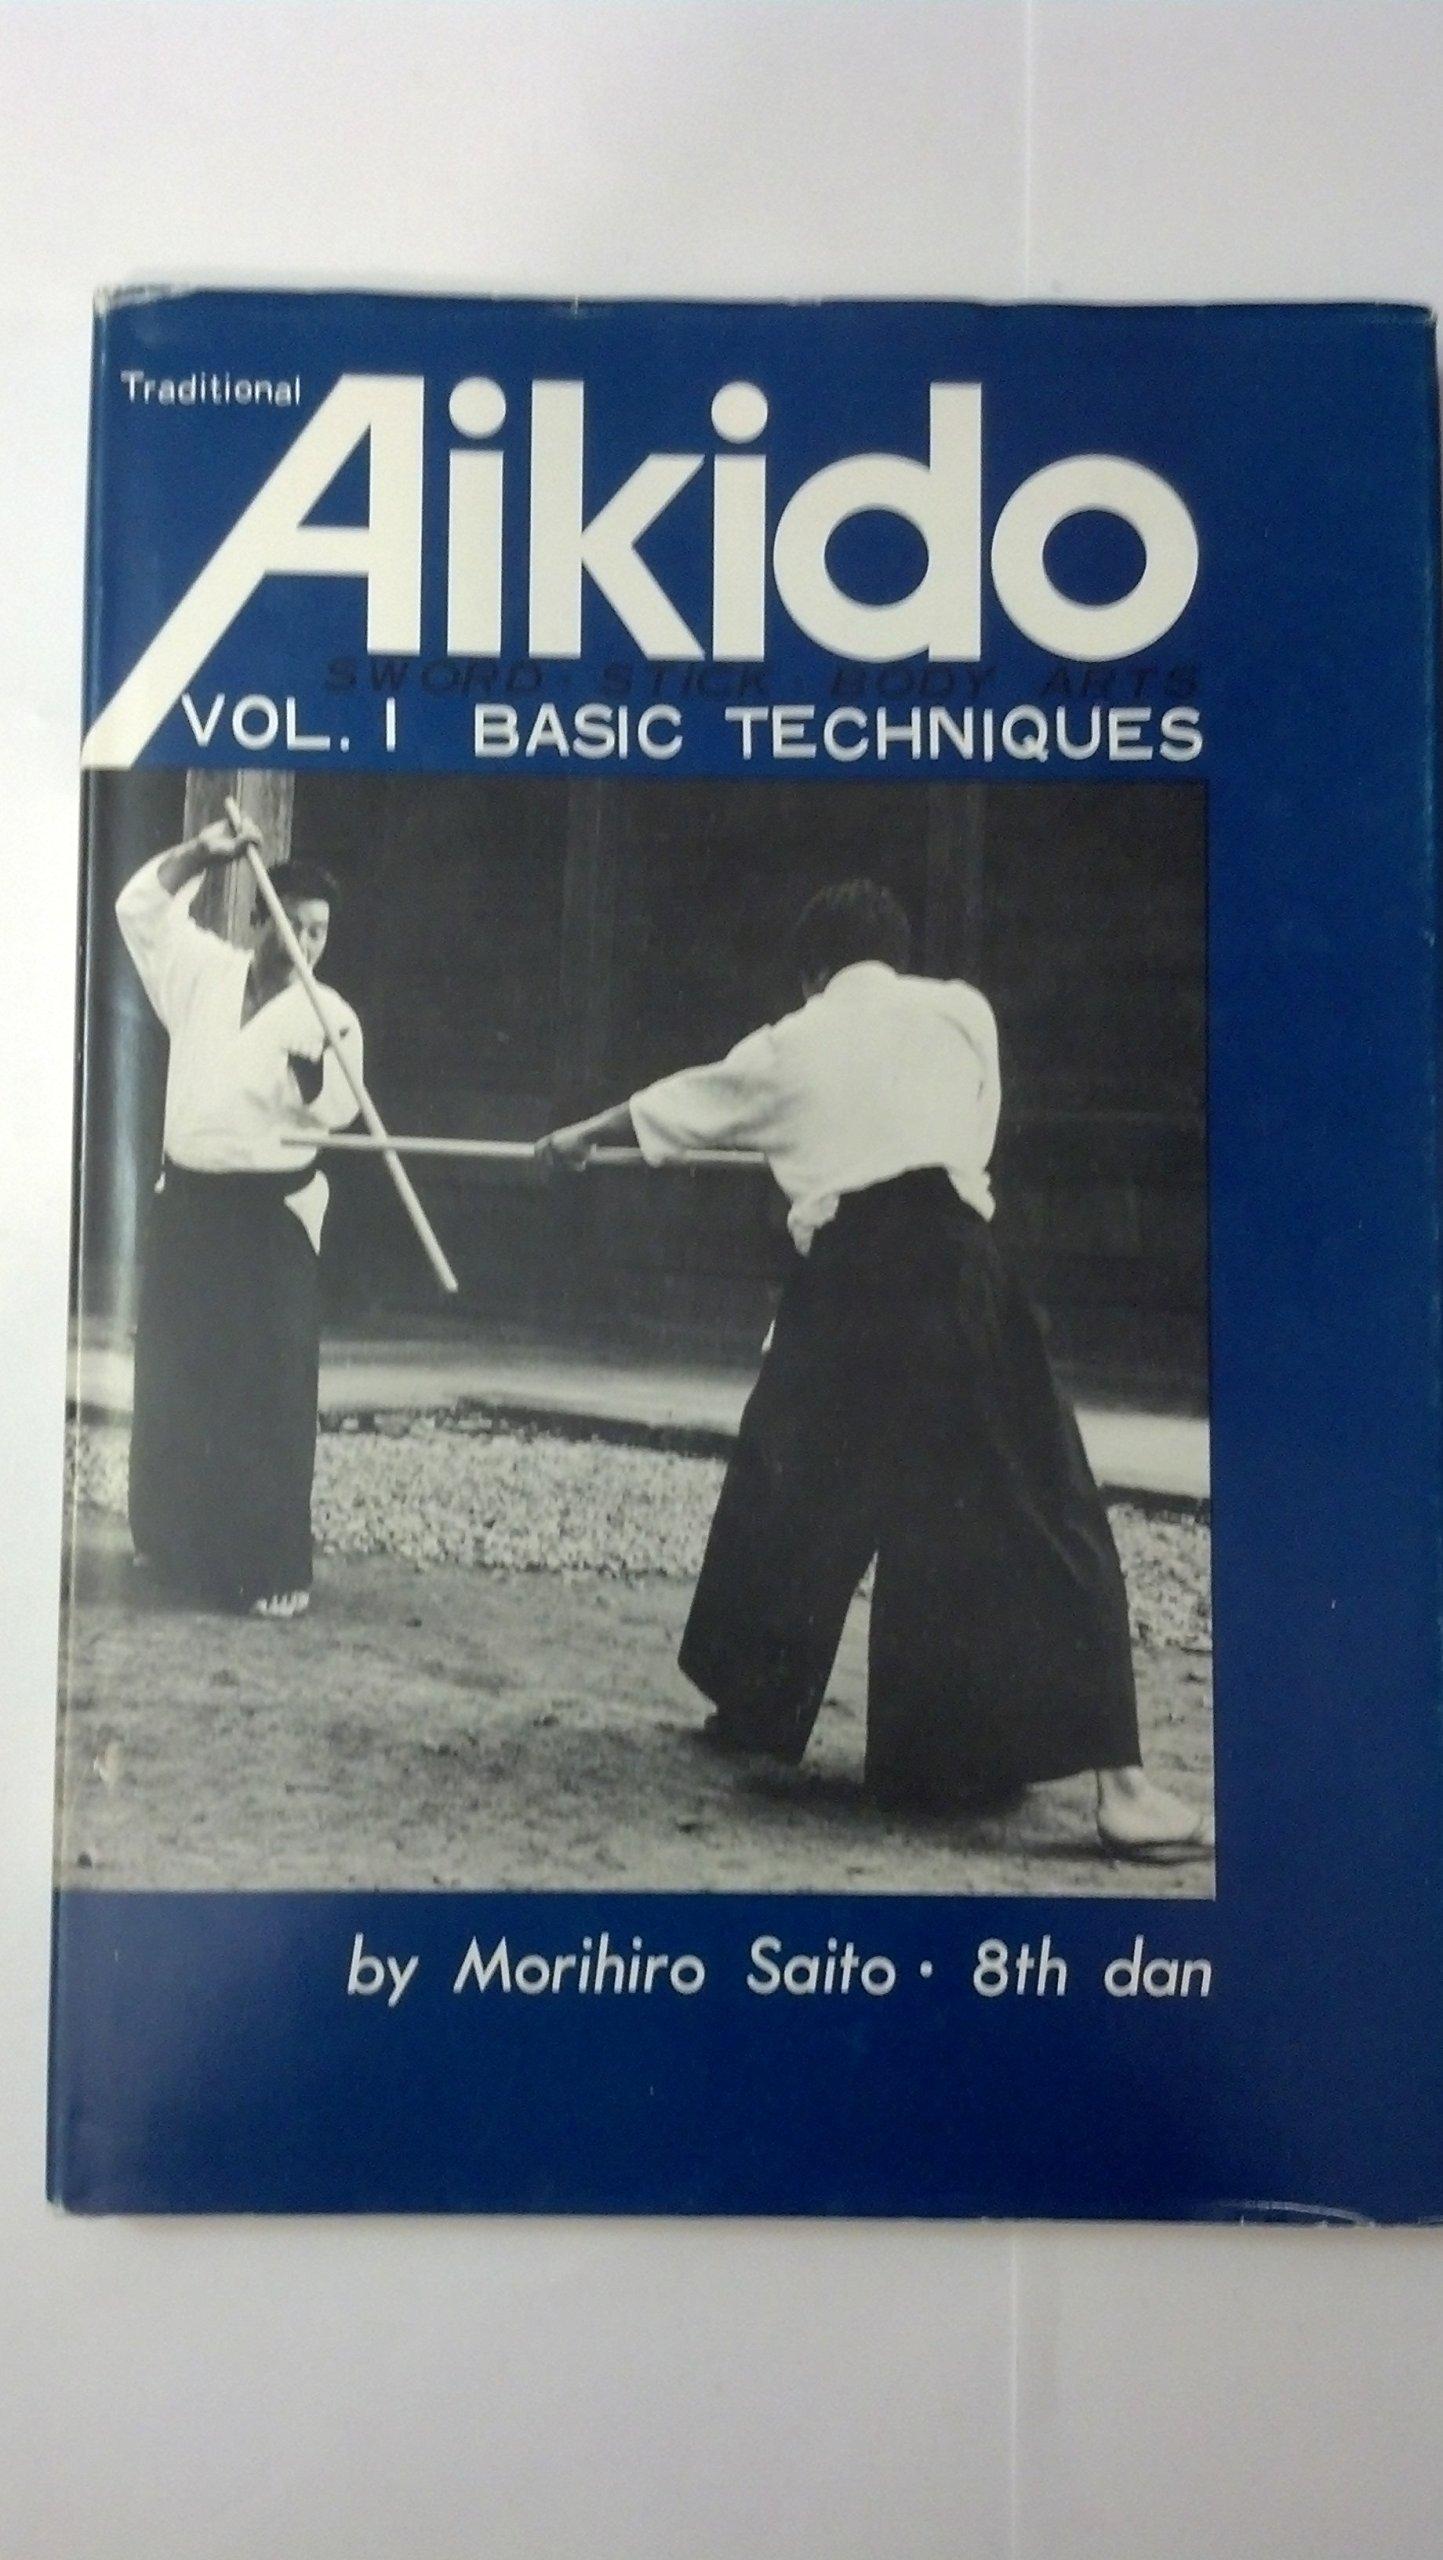 Traditional Aikido Vol 1 Basic Techniques V 1 Japanese And English Edition Saito M 9780870402661 Amazon Com Books